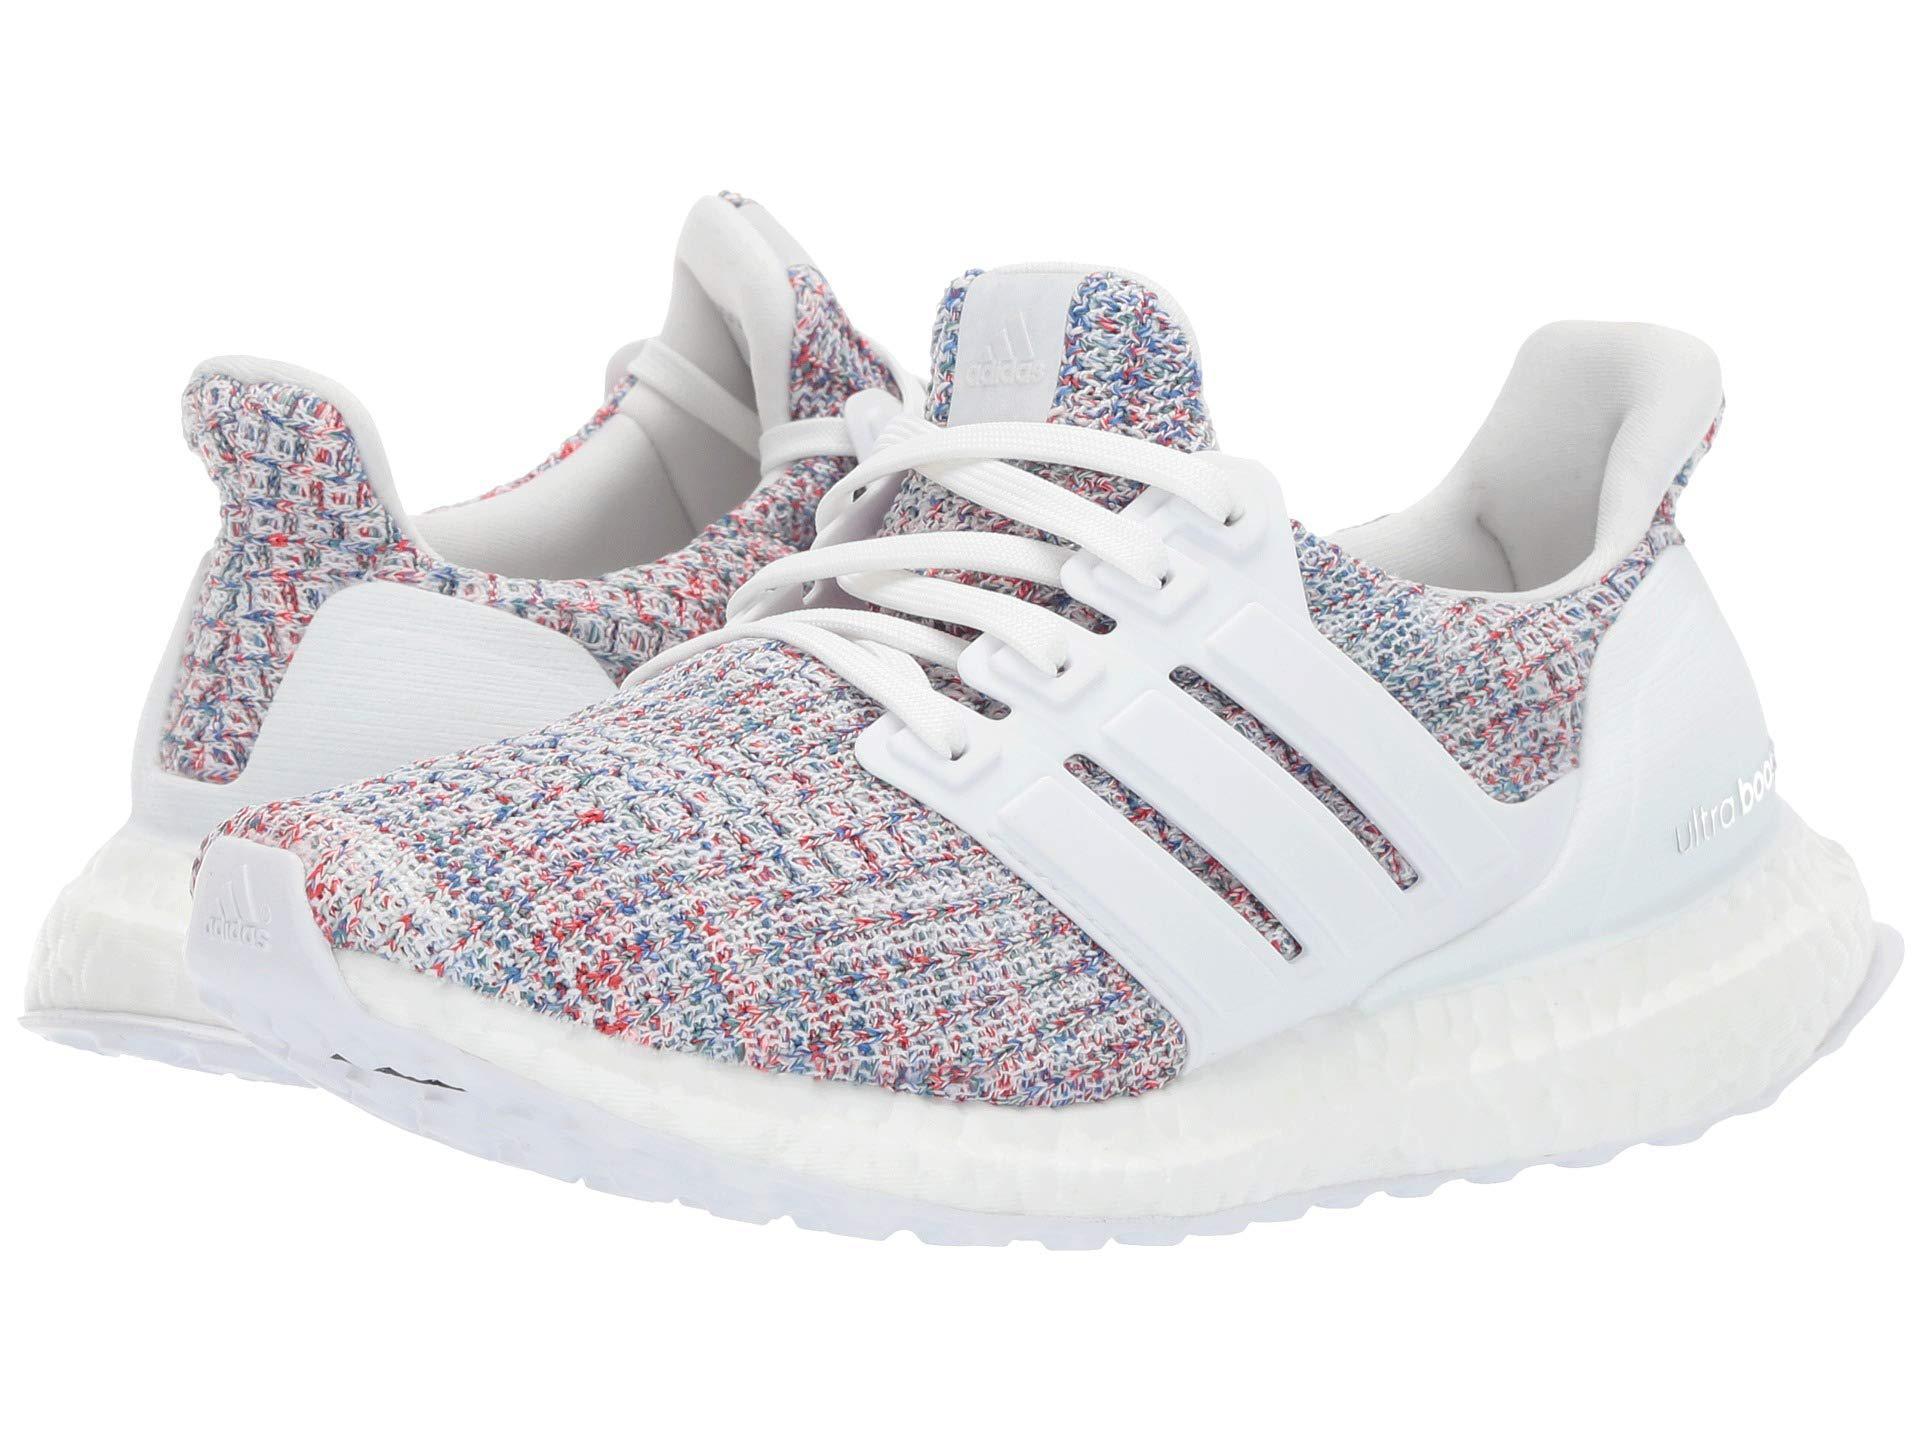 6f348f24b7de adidas Originals. White Ultraboost (ash Pearl ash Pearl) Women s Running  Shoes